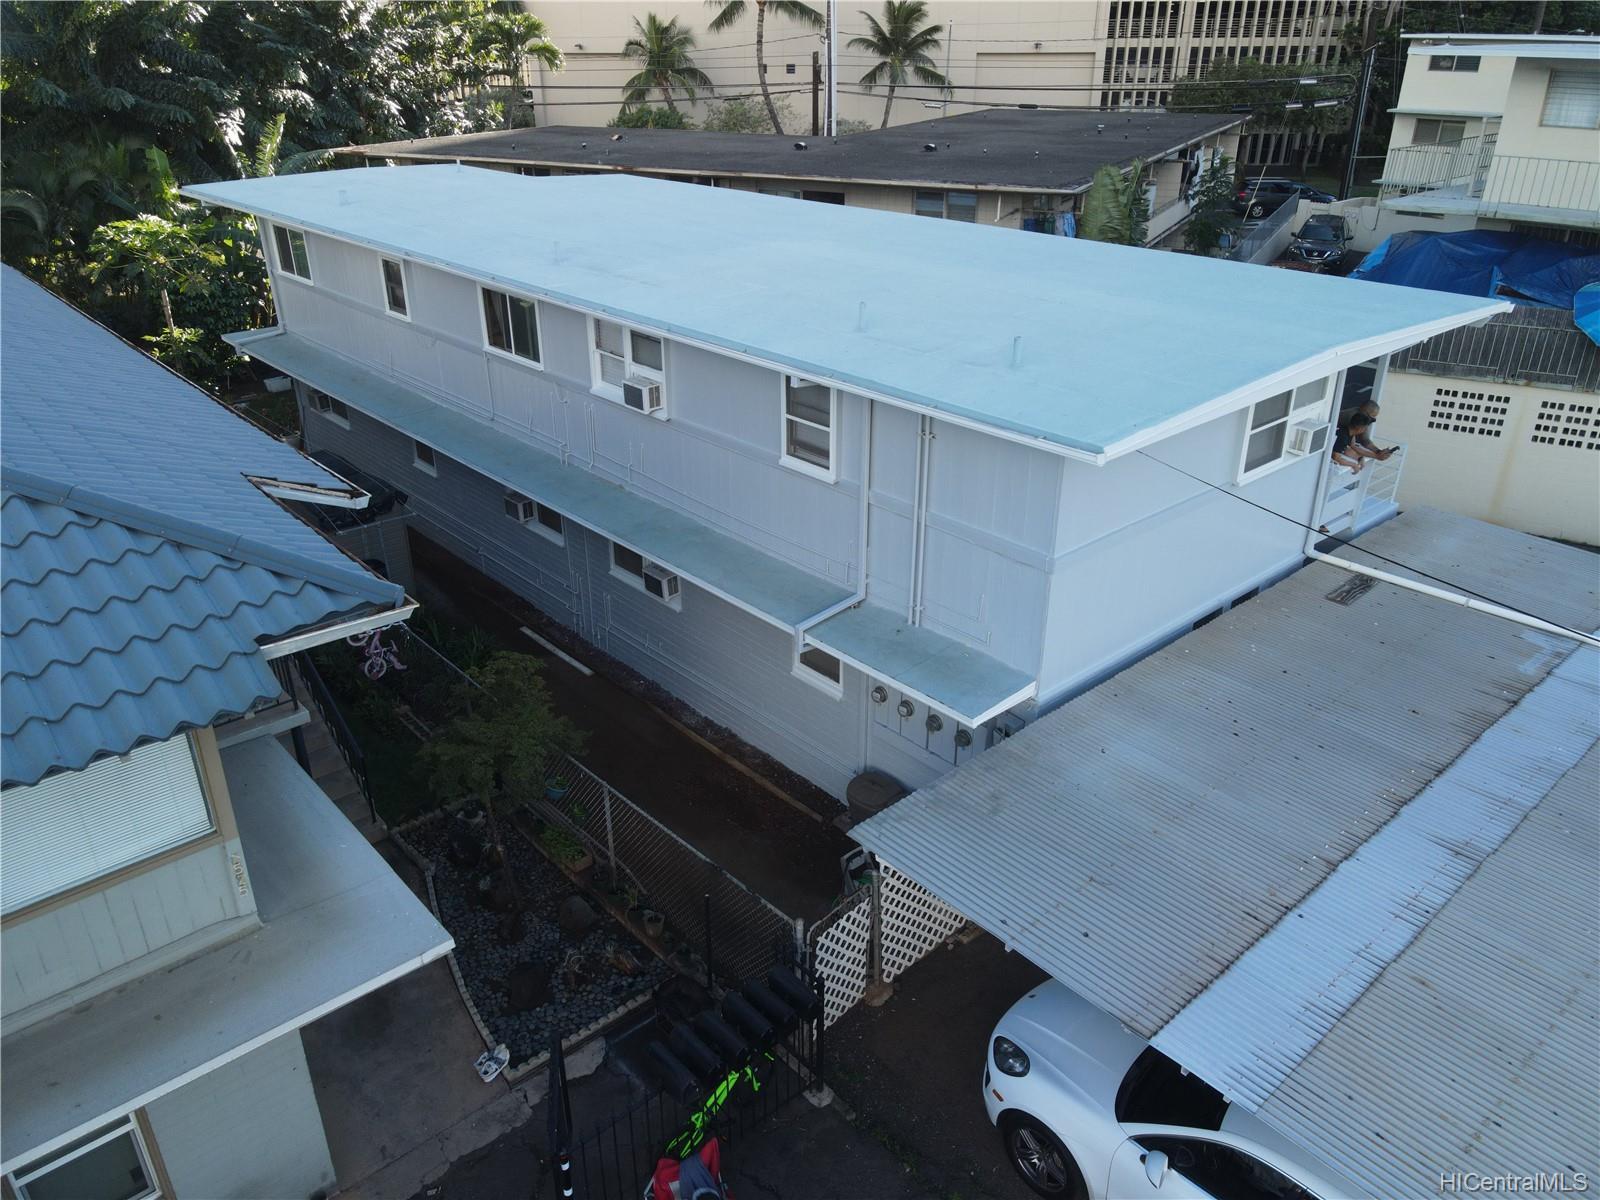 2521 Kapiolani Blvd Honolulu - Multi-family - photo 16 of 17